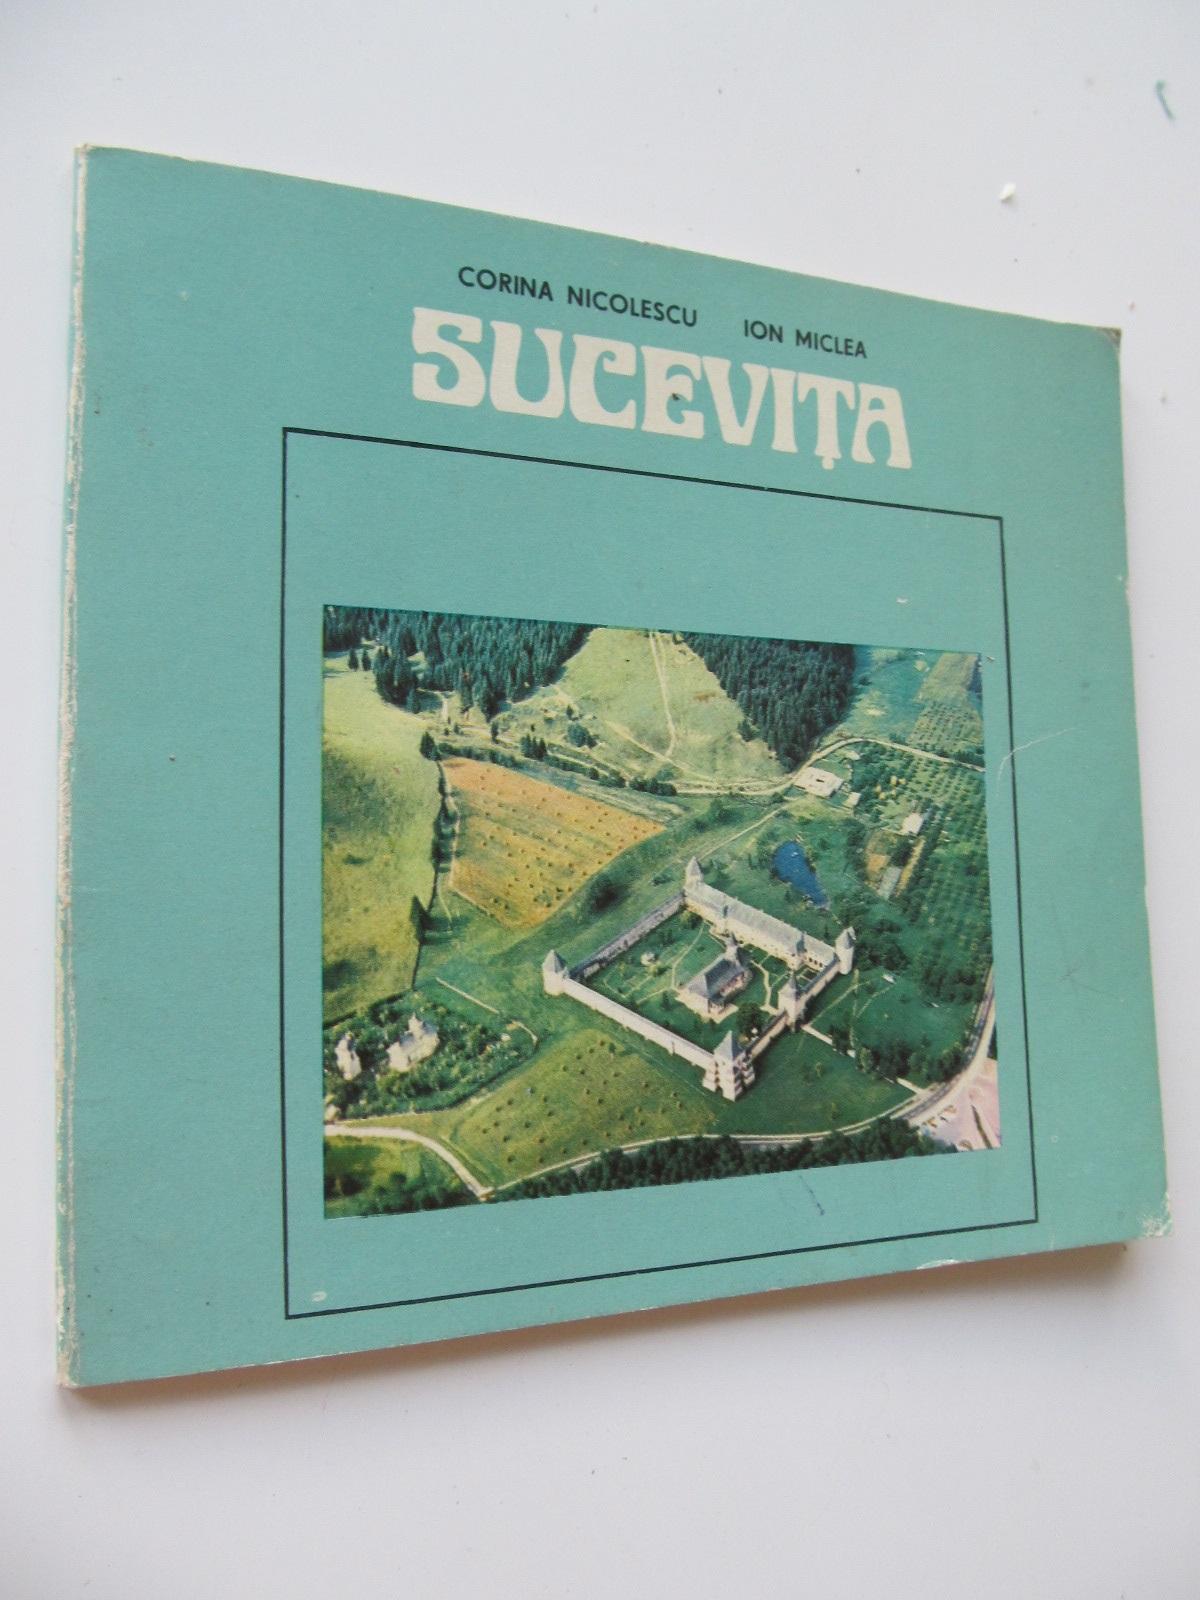 Carte Sucevita (Album) - Corina Nicolescu , Ion Miclea